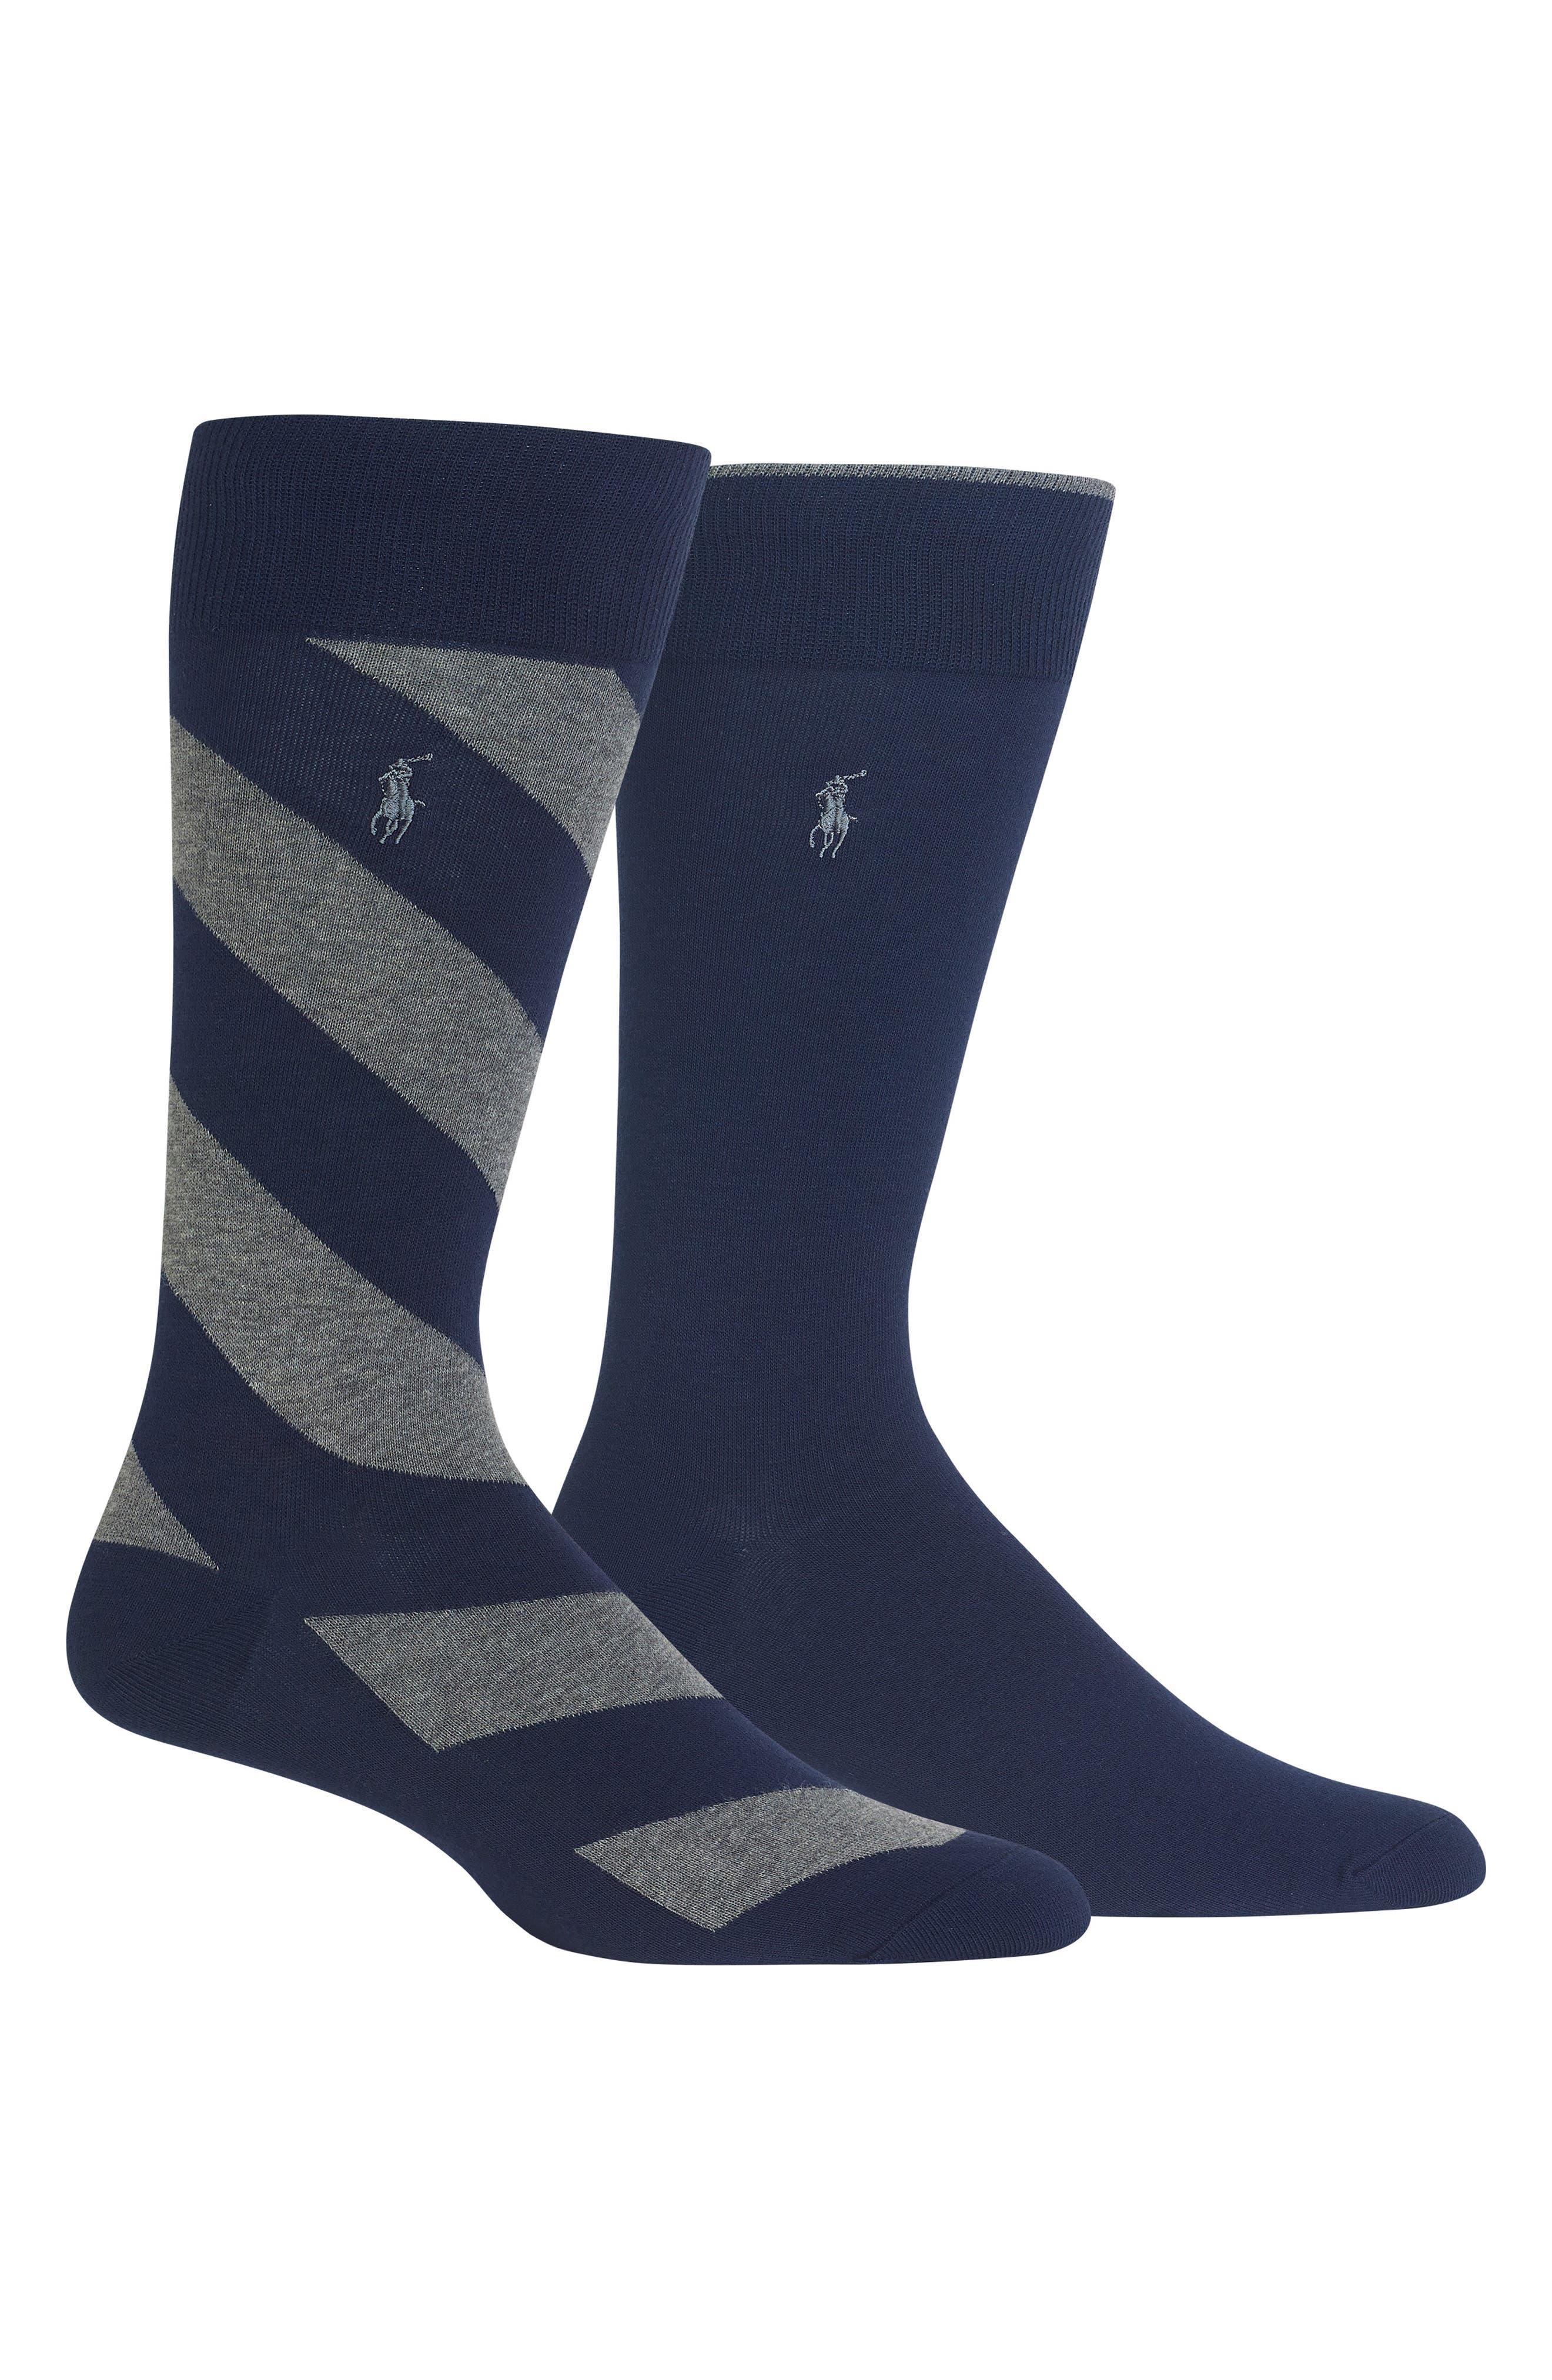 2-Pack Diagonal Stripe & Solid Socks,                         Main,                         color, NAVY